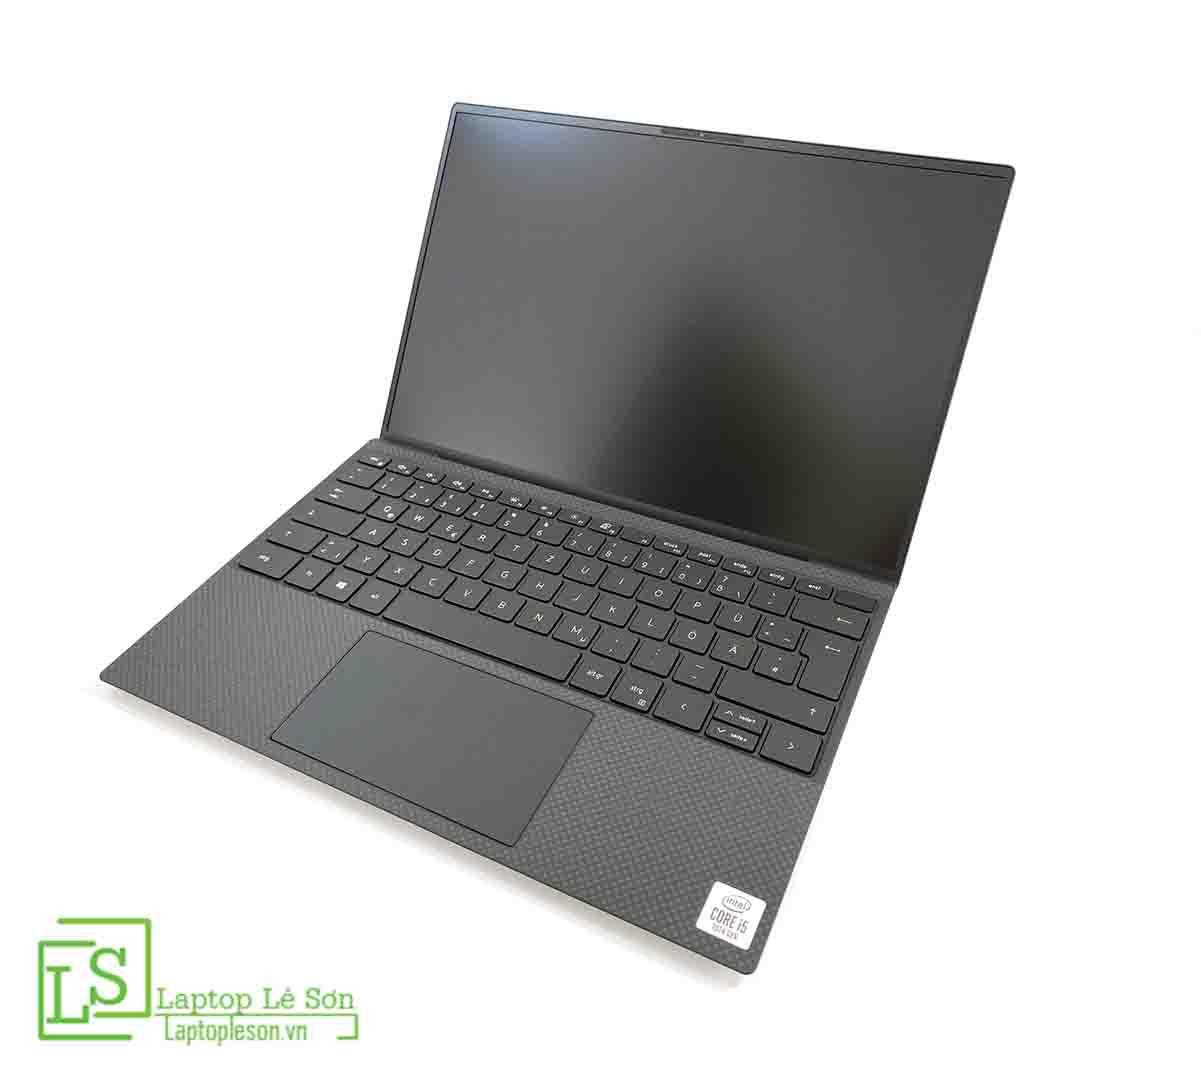 Dell XPS 13 9300 Laptop Lê Sơn 02